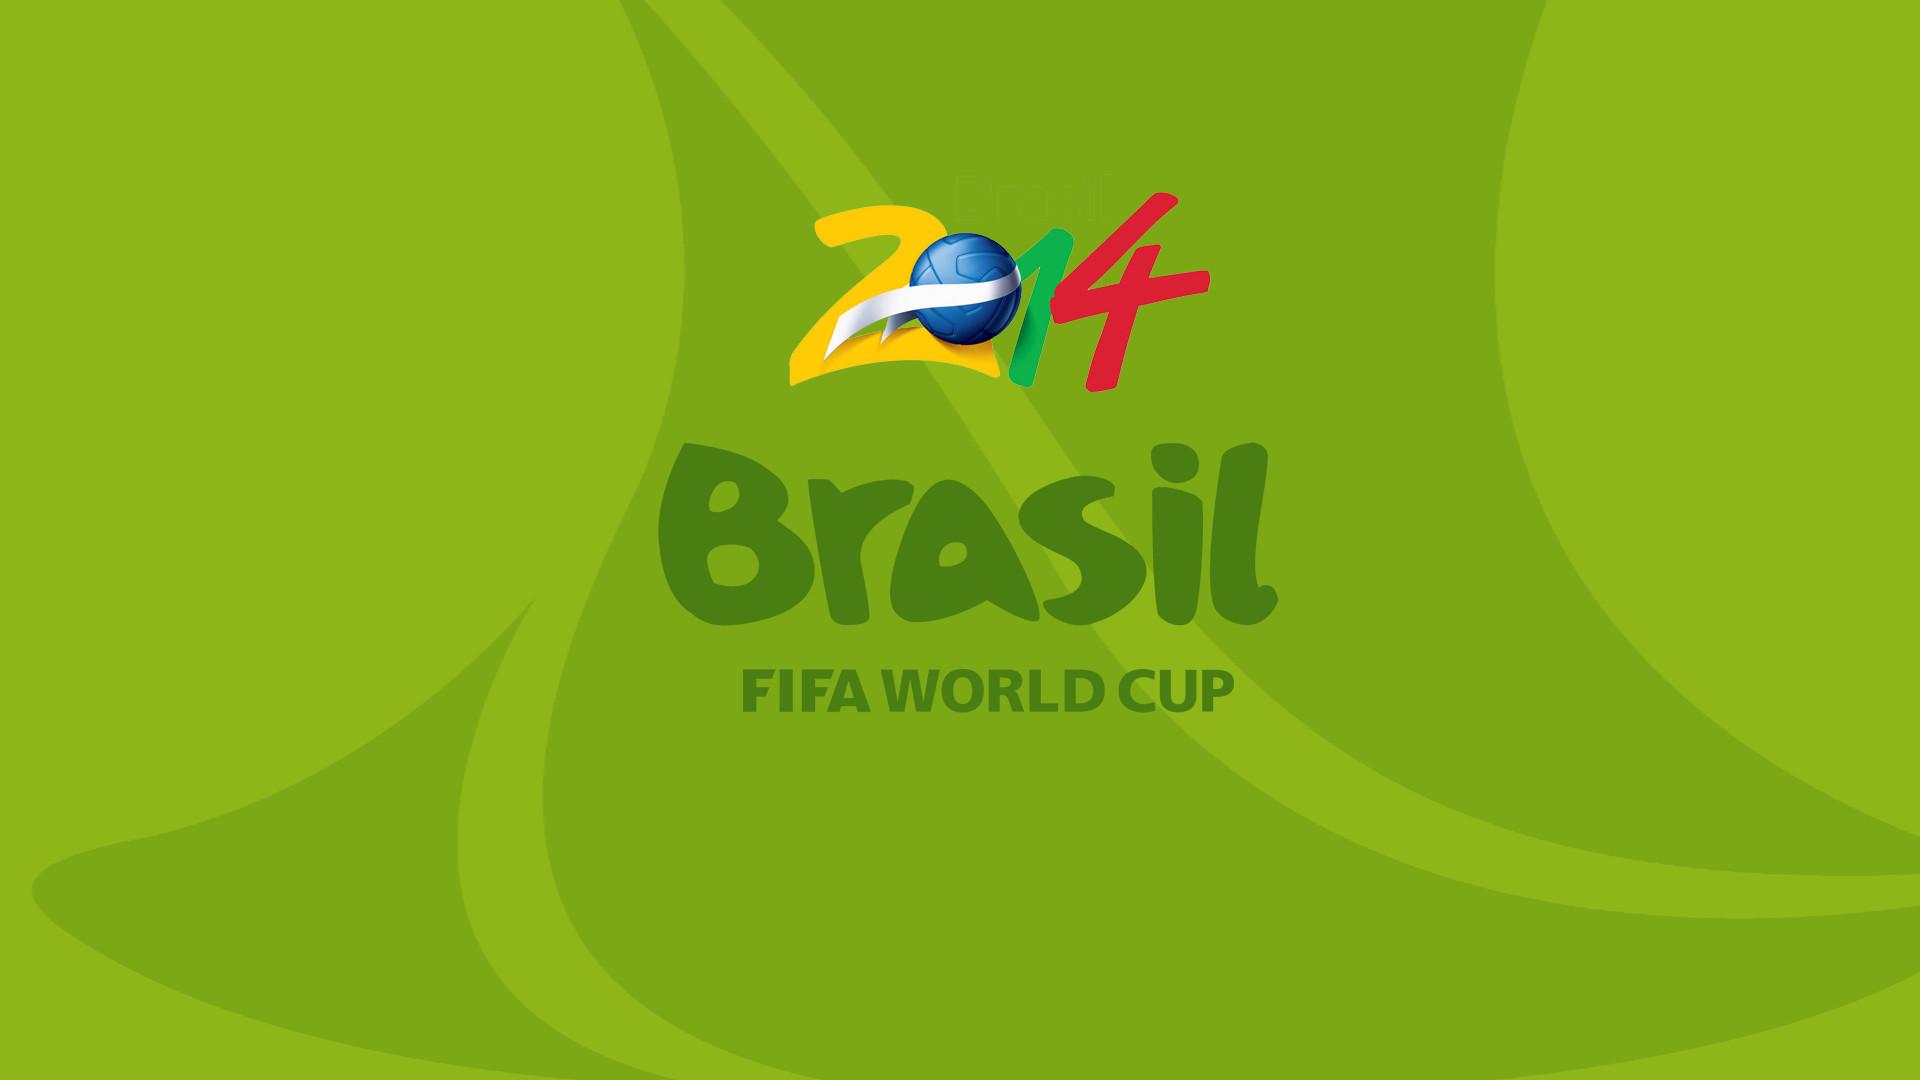 2014 Brazil Logo World Cup Hd Wallpapers - Fifa World Cup 2014 , HD Wallpaper & Backgrounds